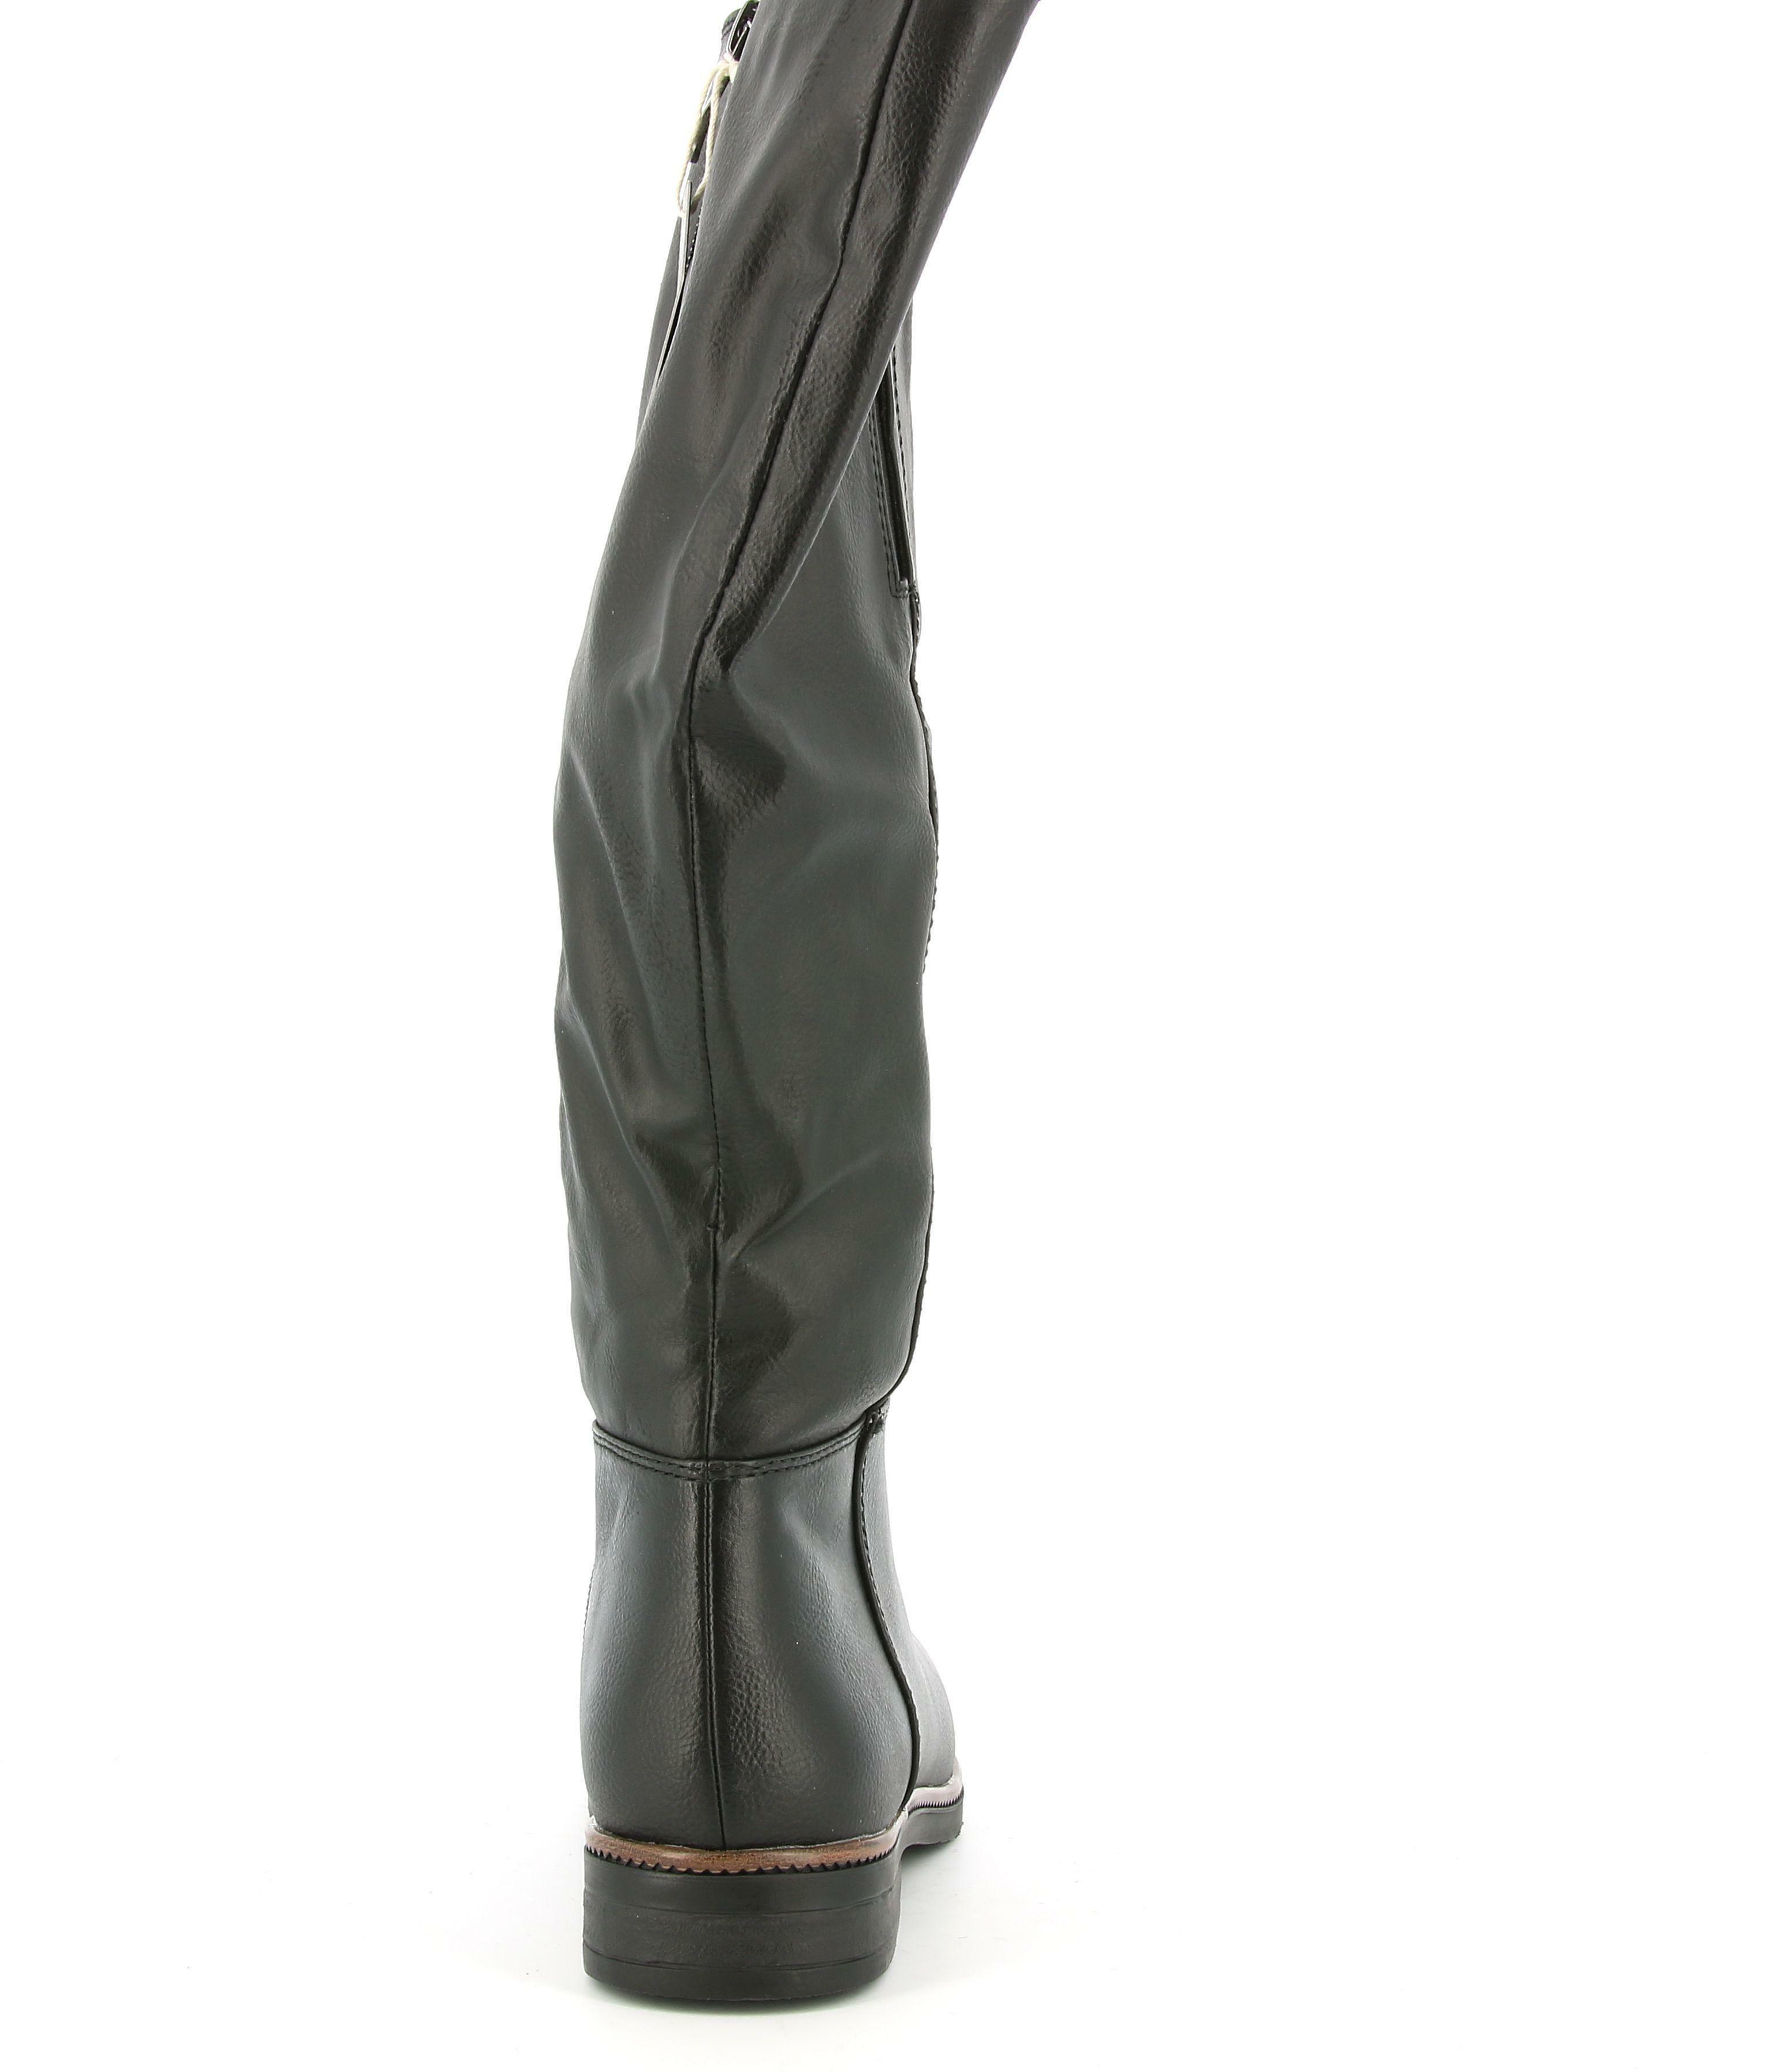 marco tozzi marco tozzi 25506 black stivale basso donna